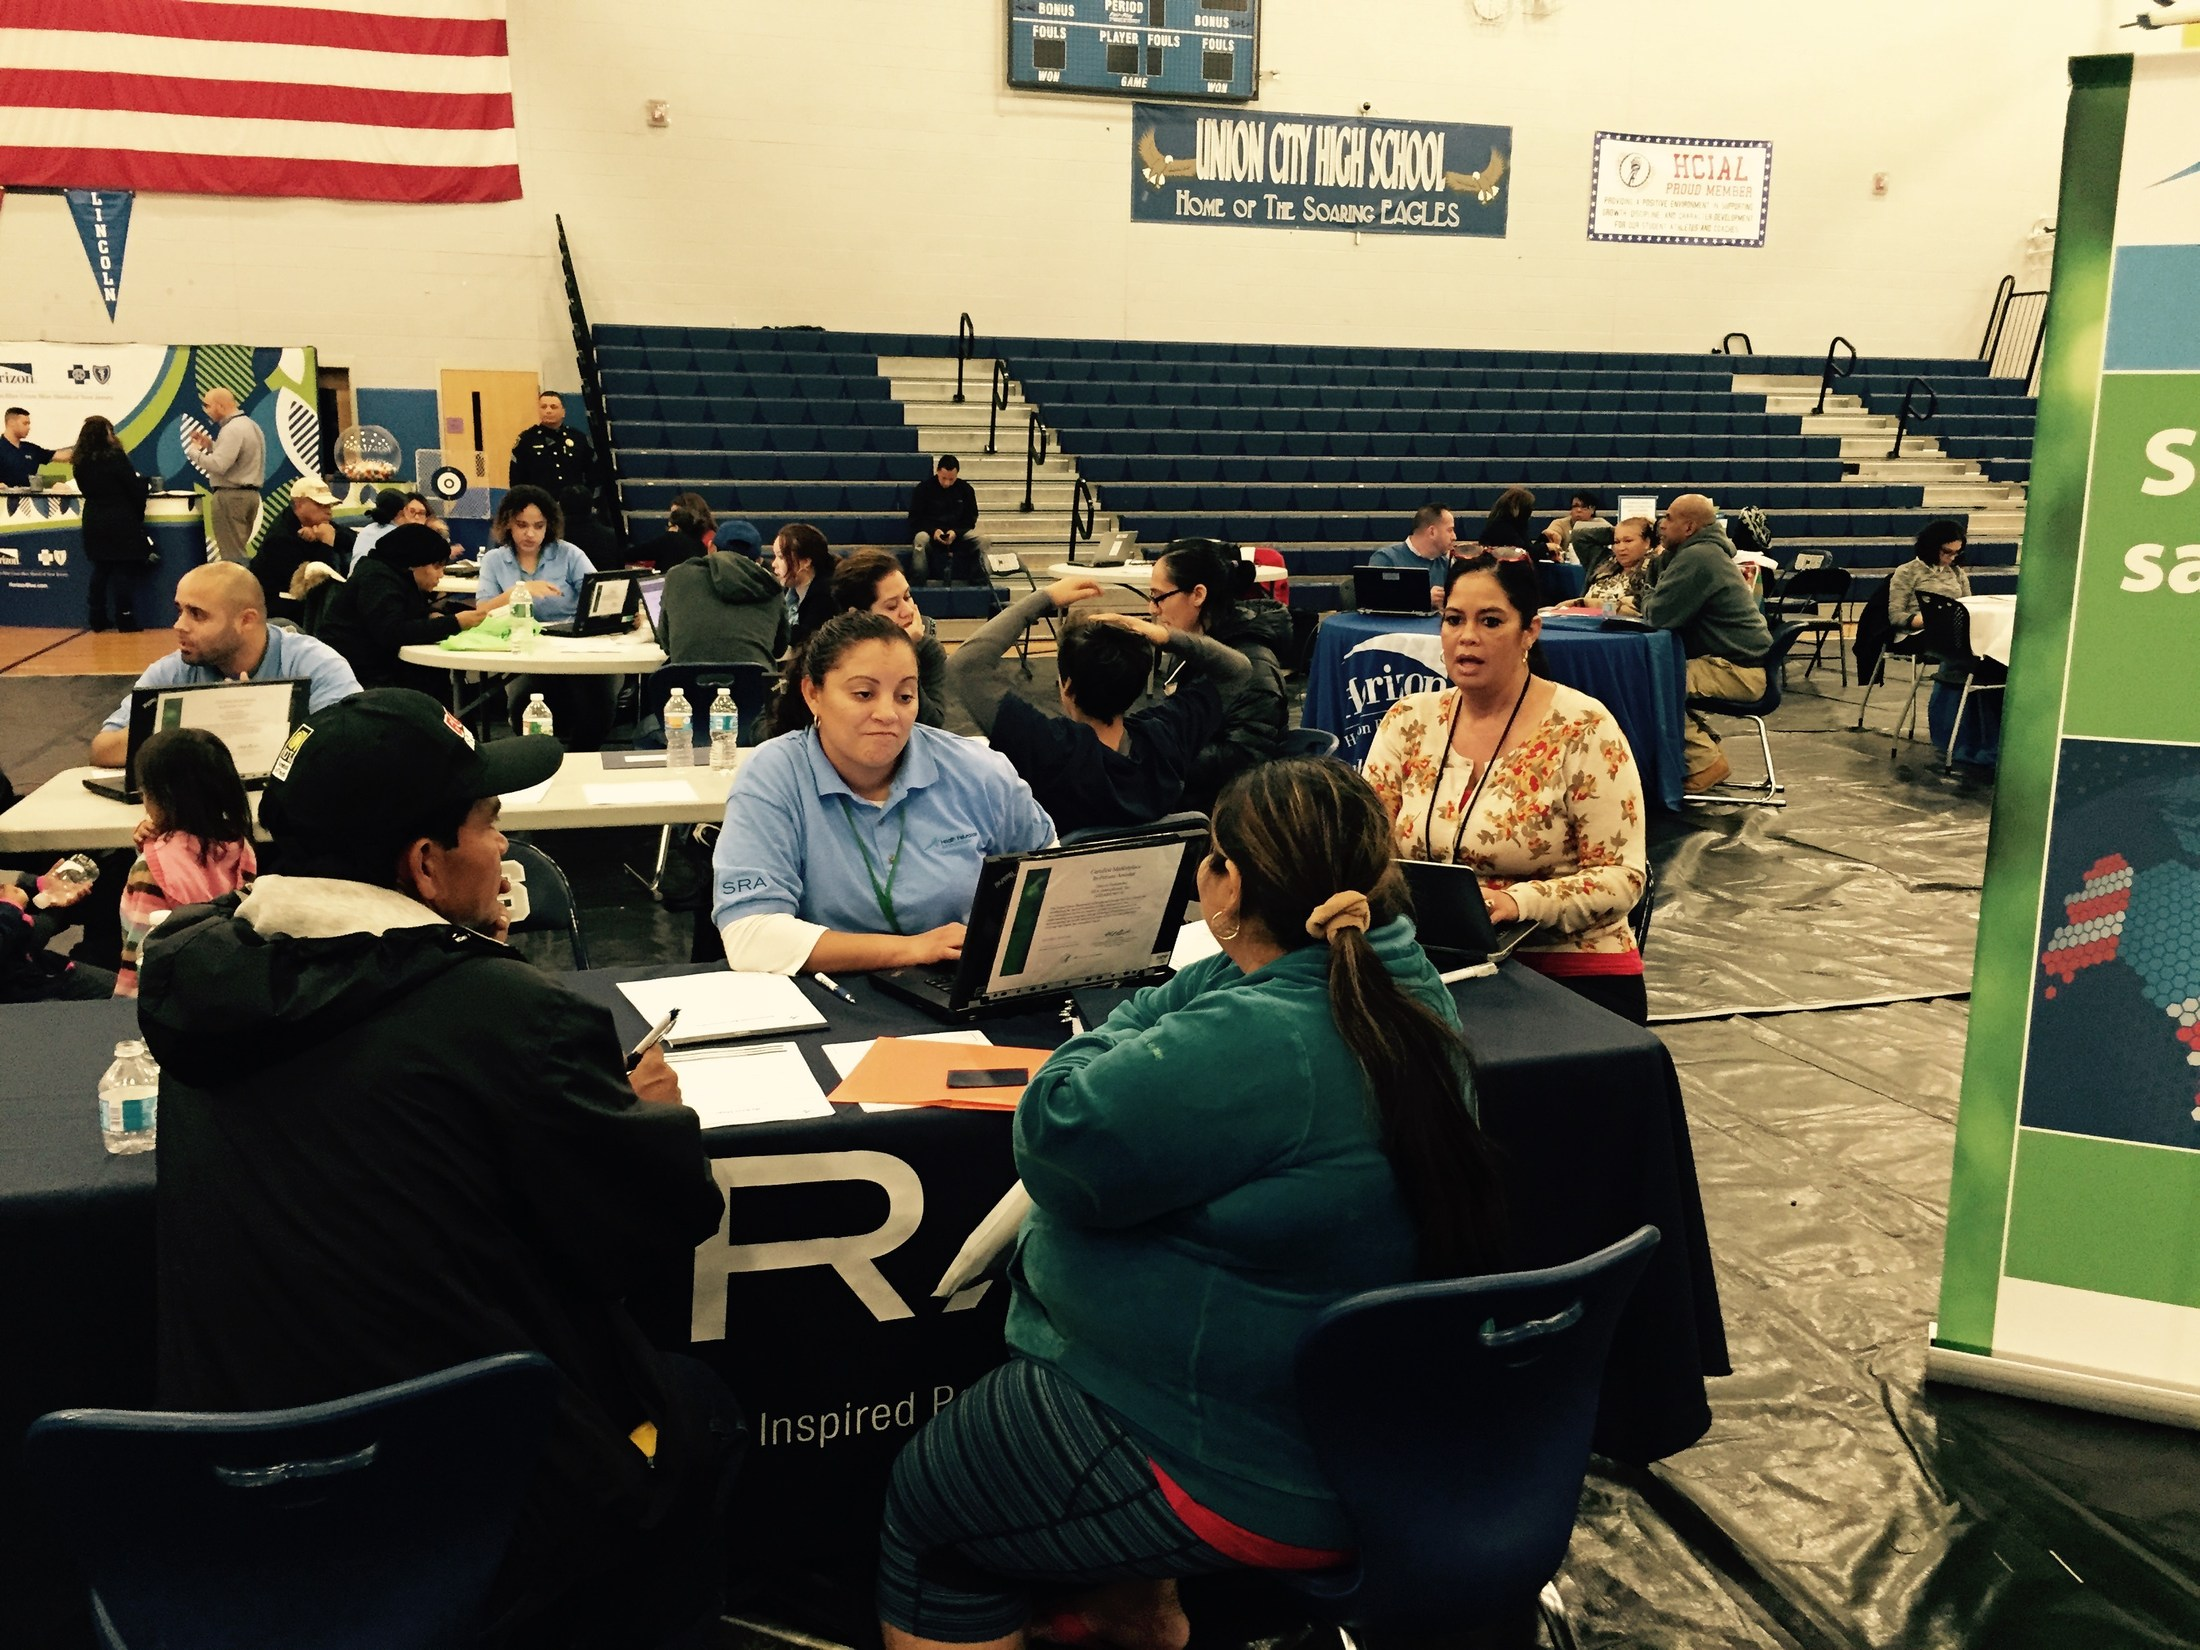 Health Care Representatives talking to Union City Parents